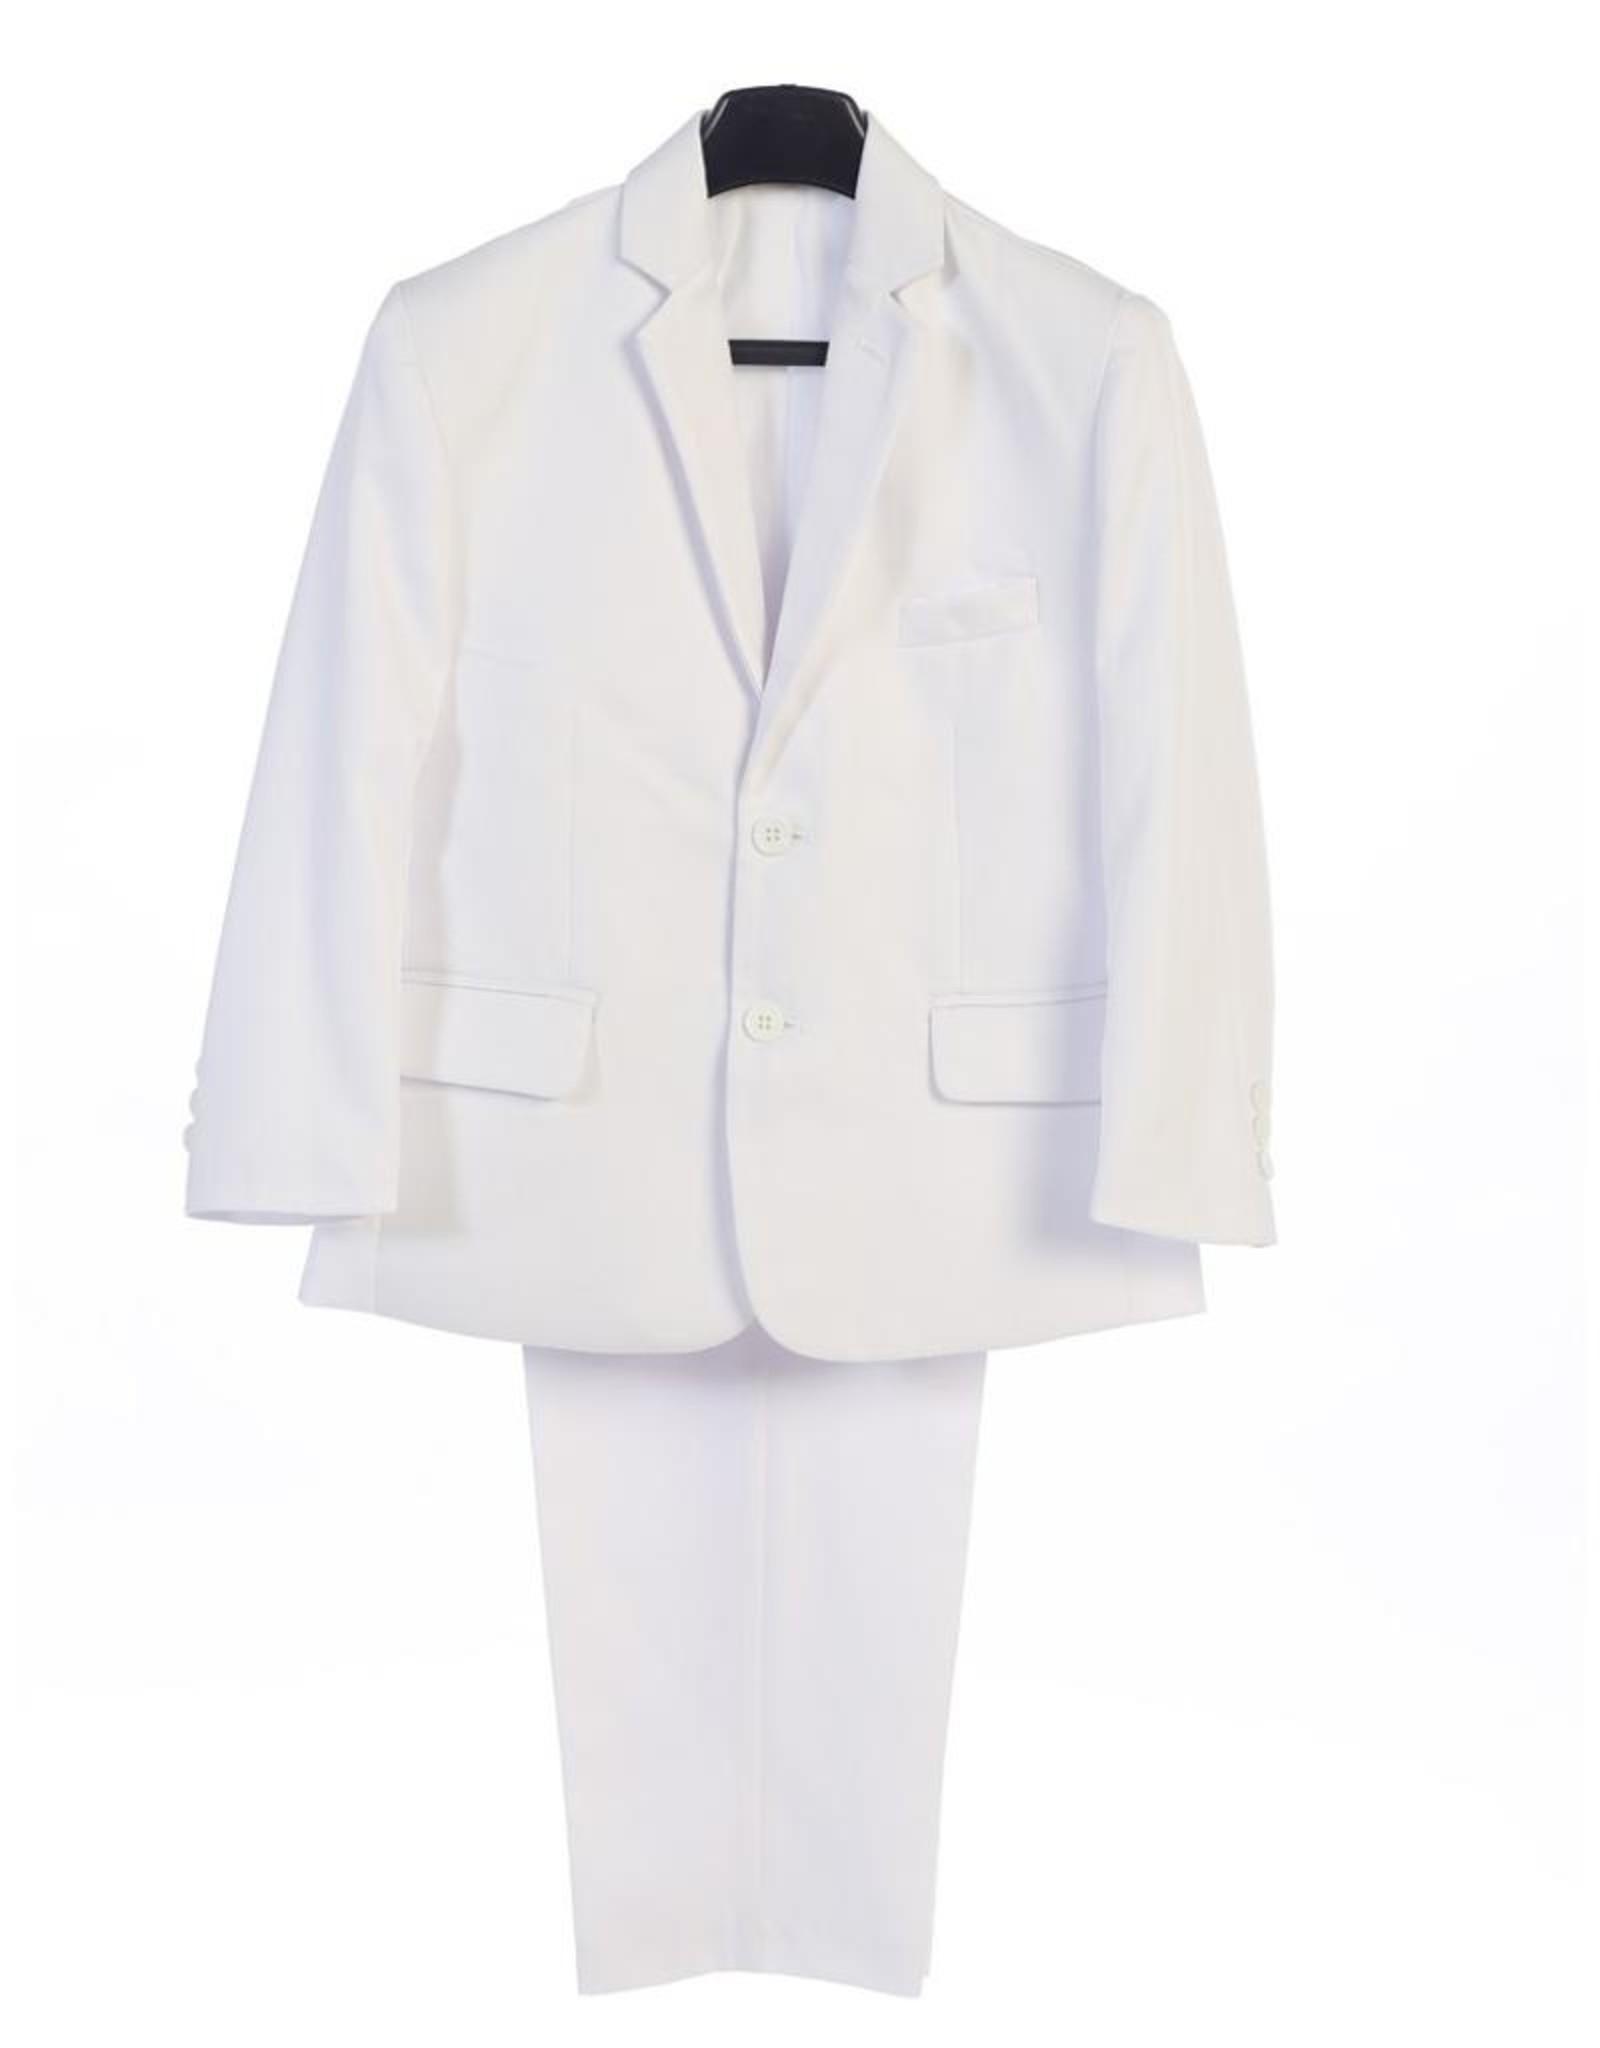 Lito 2 Piece Suit